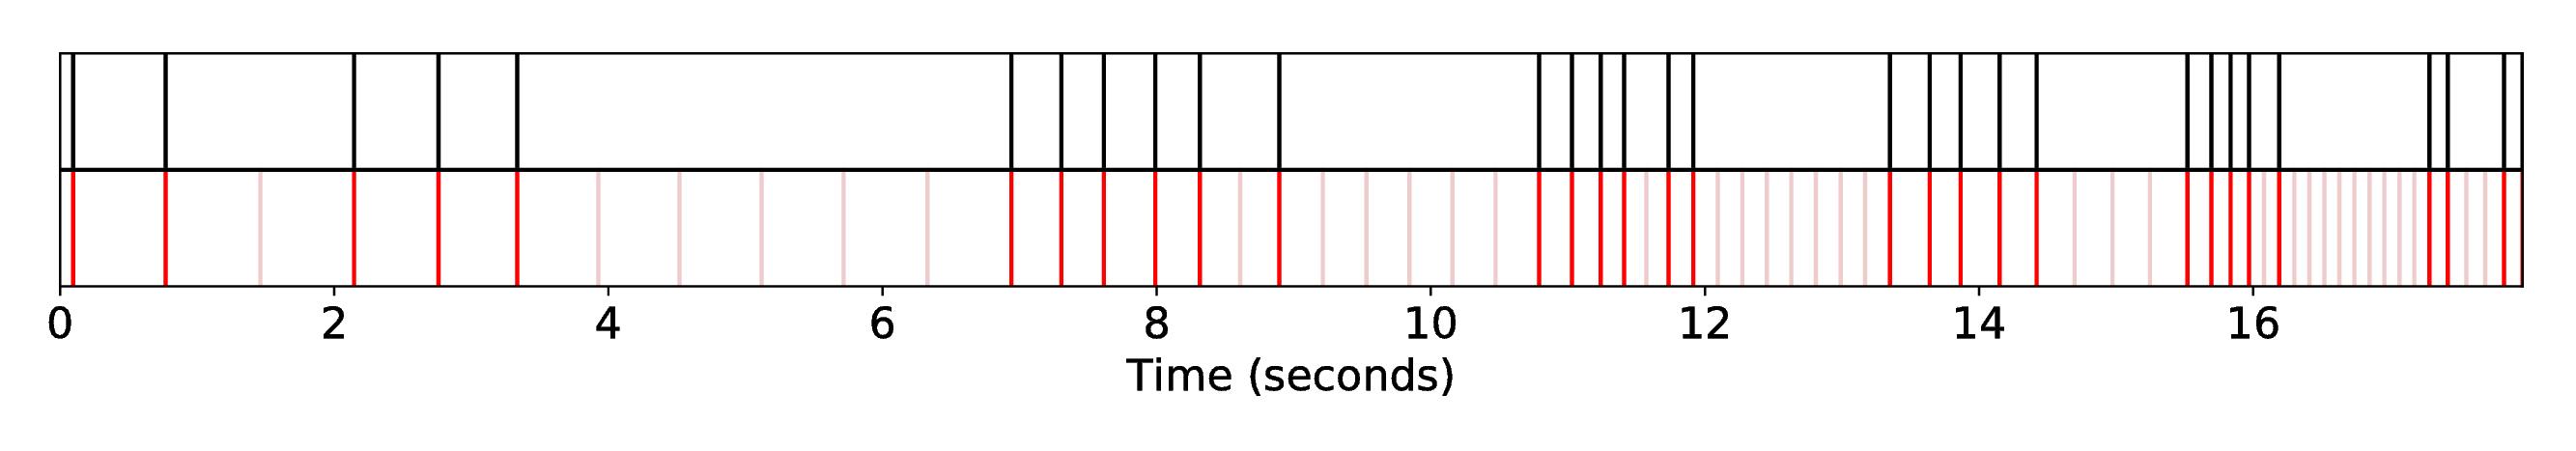 DP1_INT1_R-Syn-InIrGa__S-Fandango__SequenceAlignment